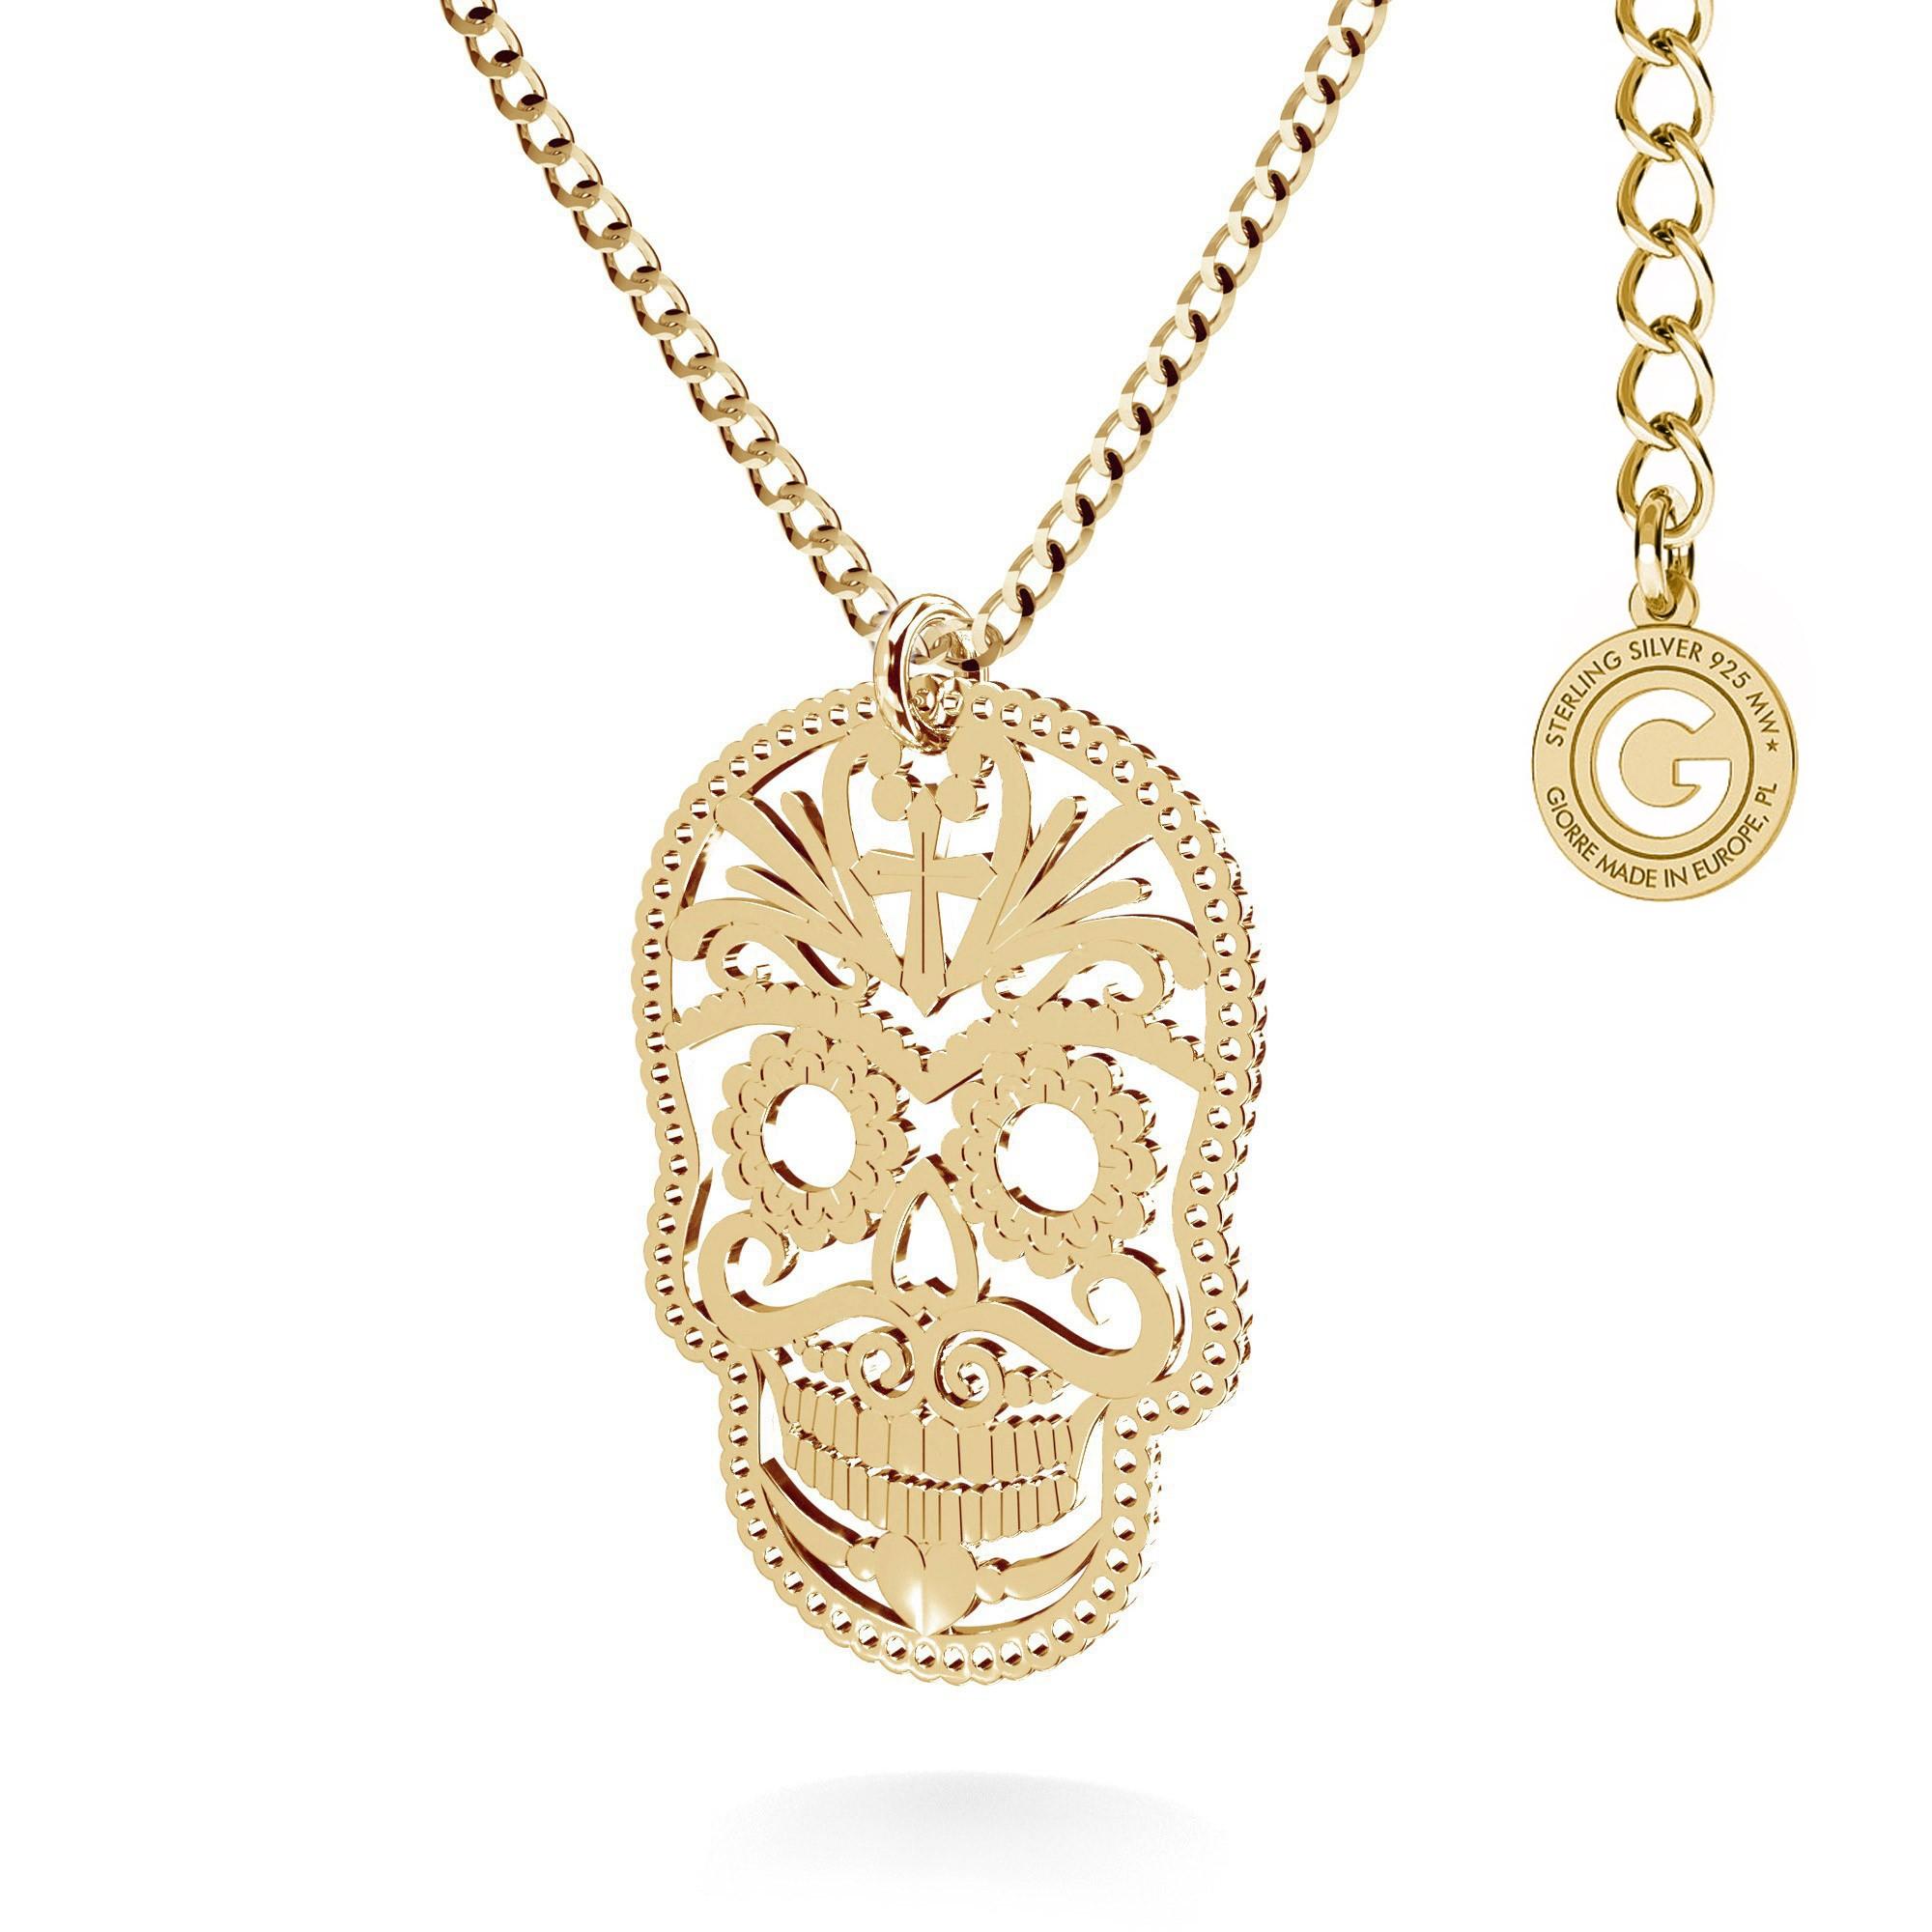 MON DÉFI SUGAR SKULL necklace sterling silver 925